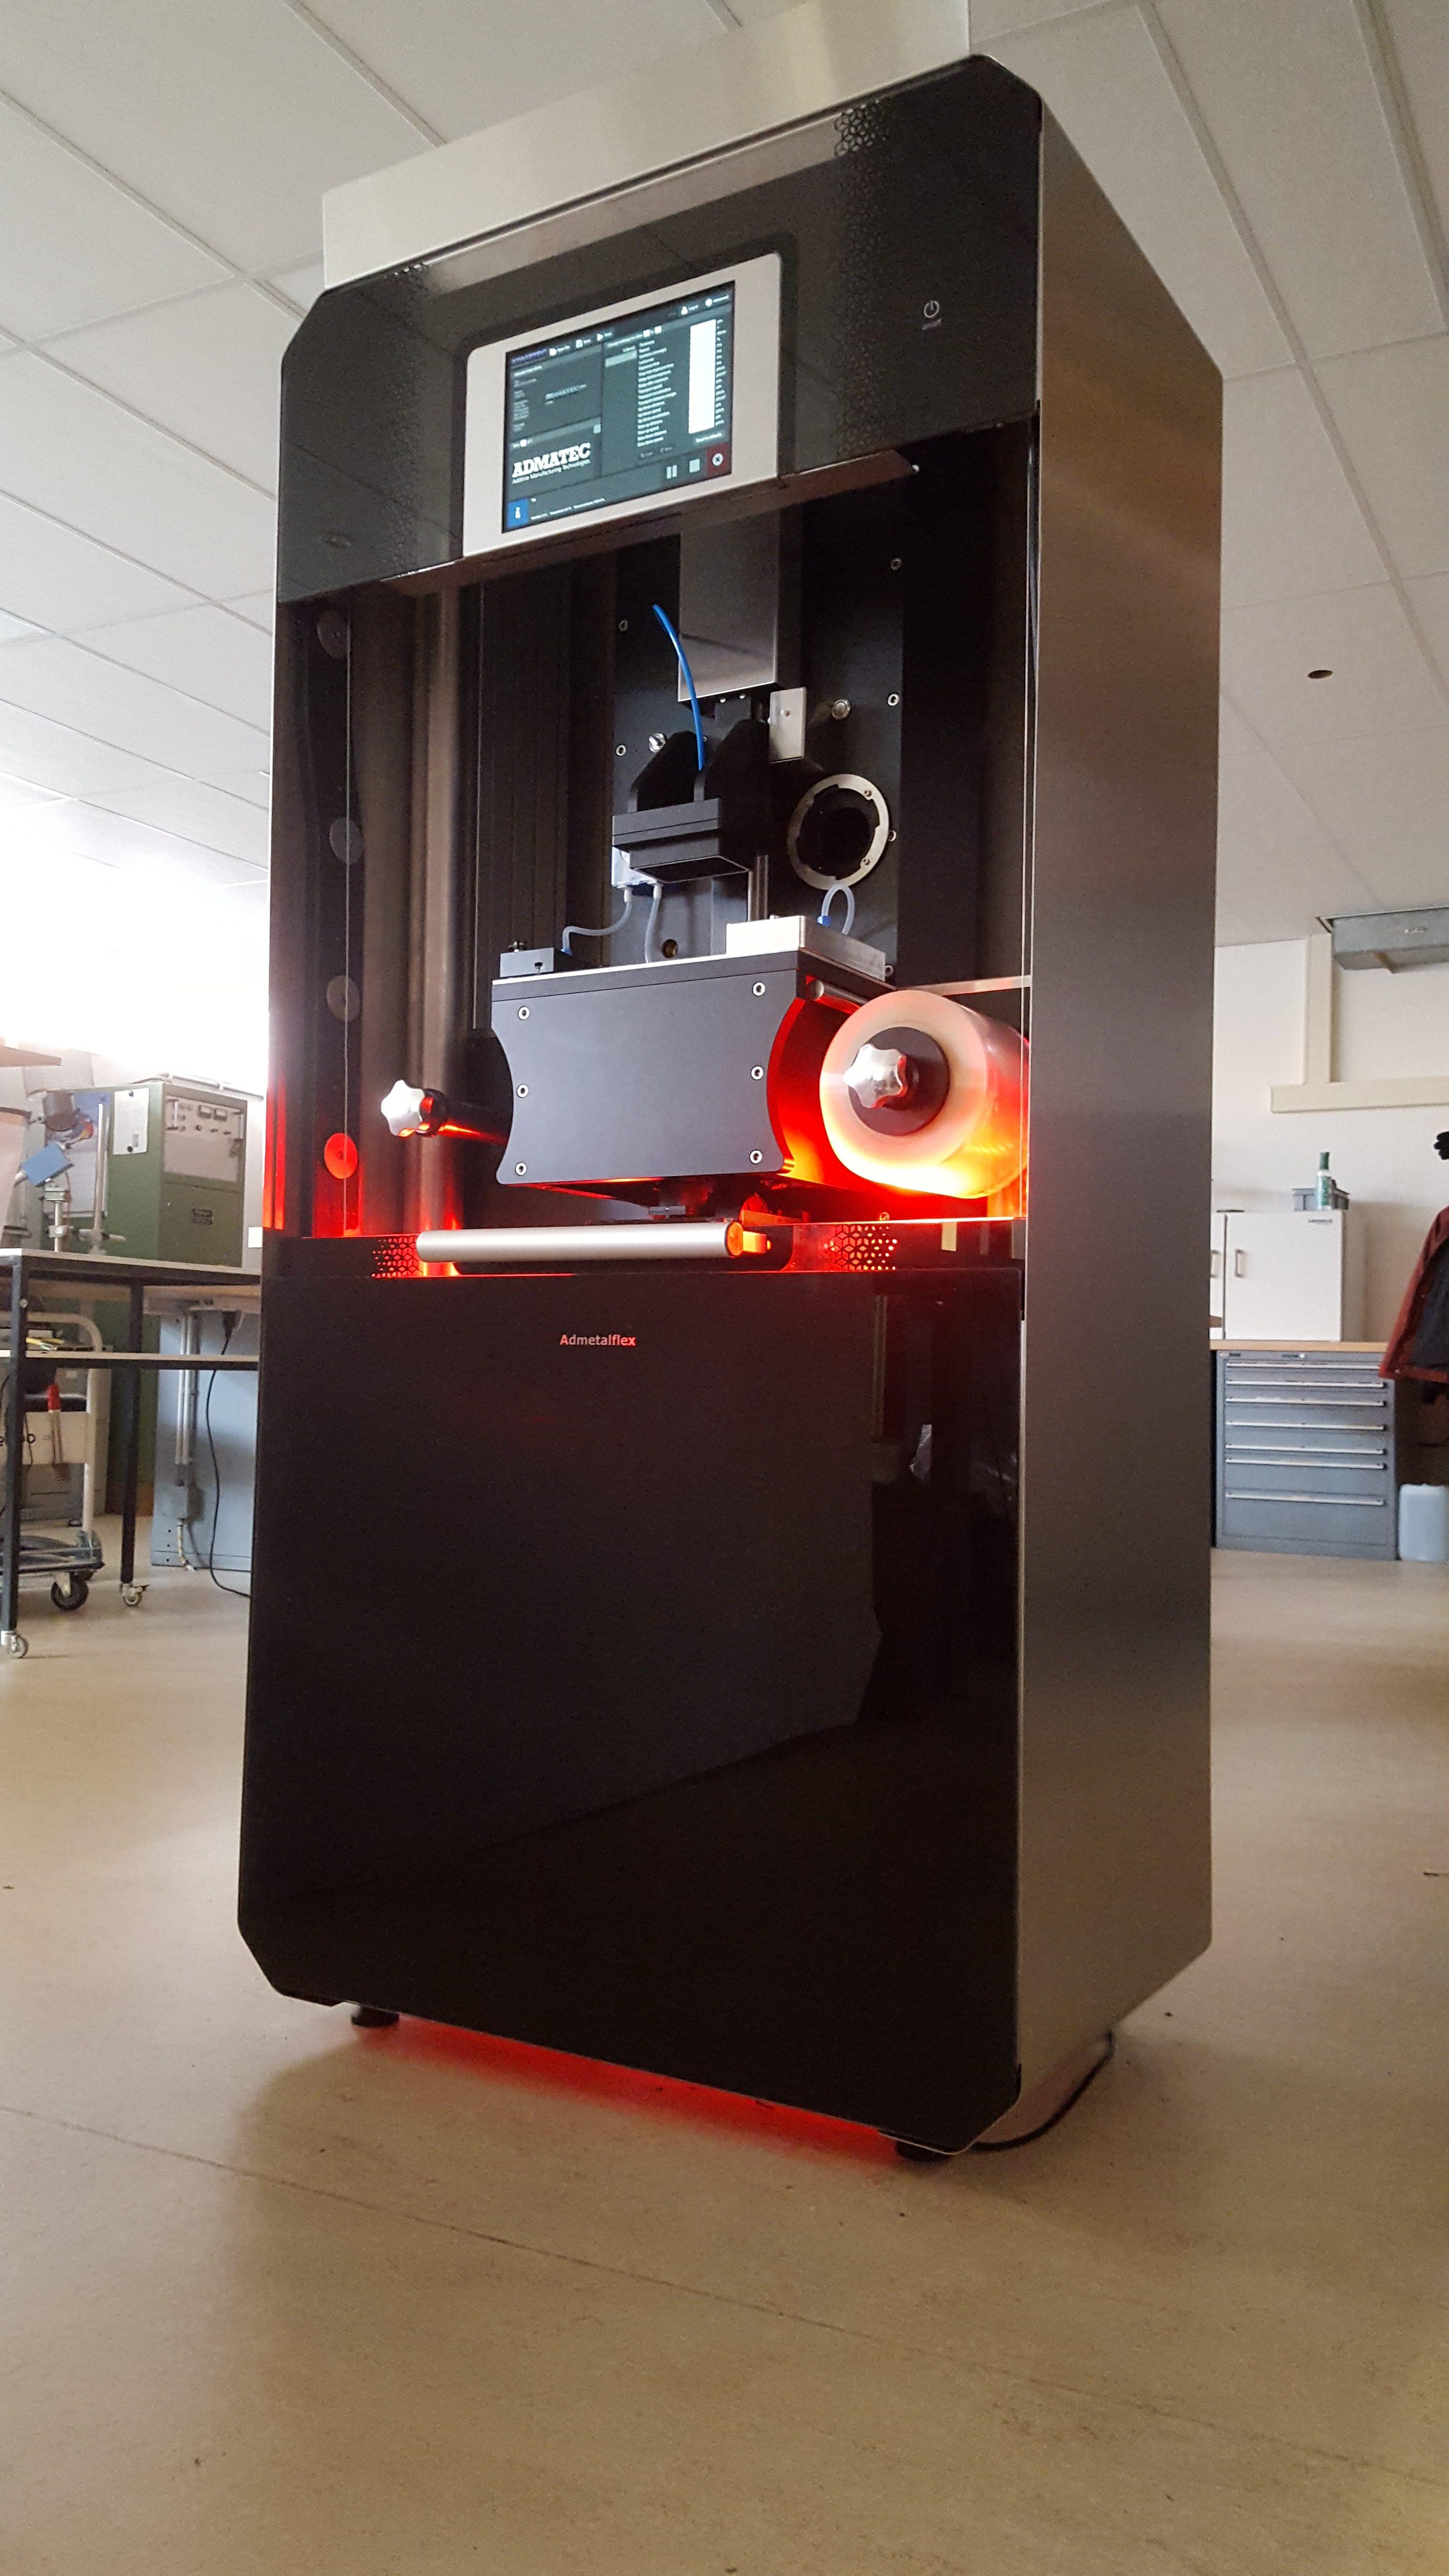 admetalflex 3d drucker admatec e1489476405161 - Admatec und ECN stellen ADMETALFLEX 130 3D-Drucker für Metall vor